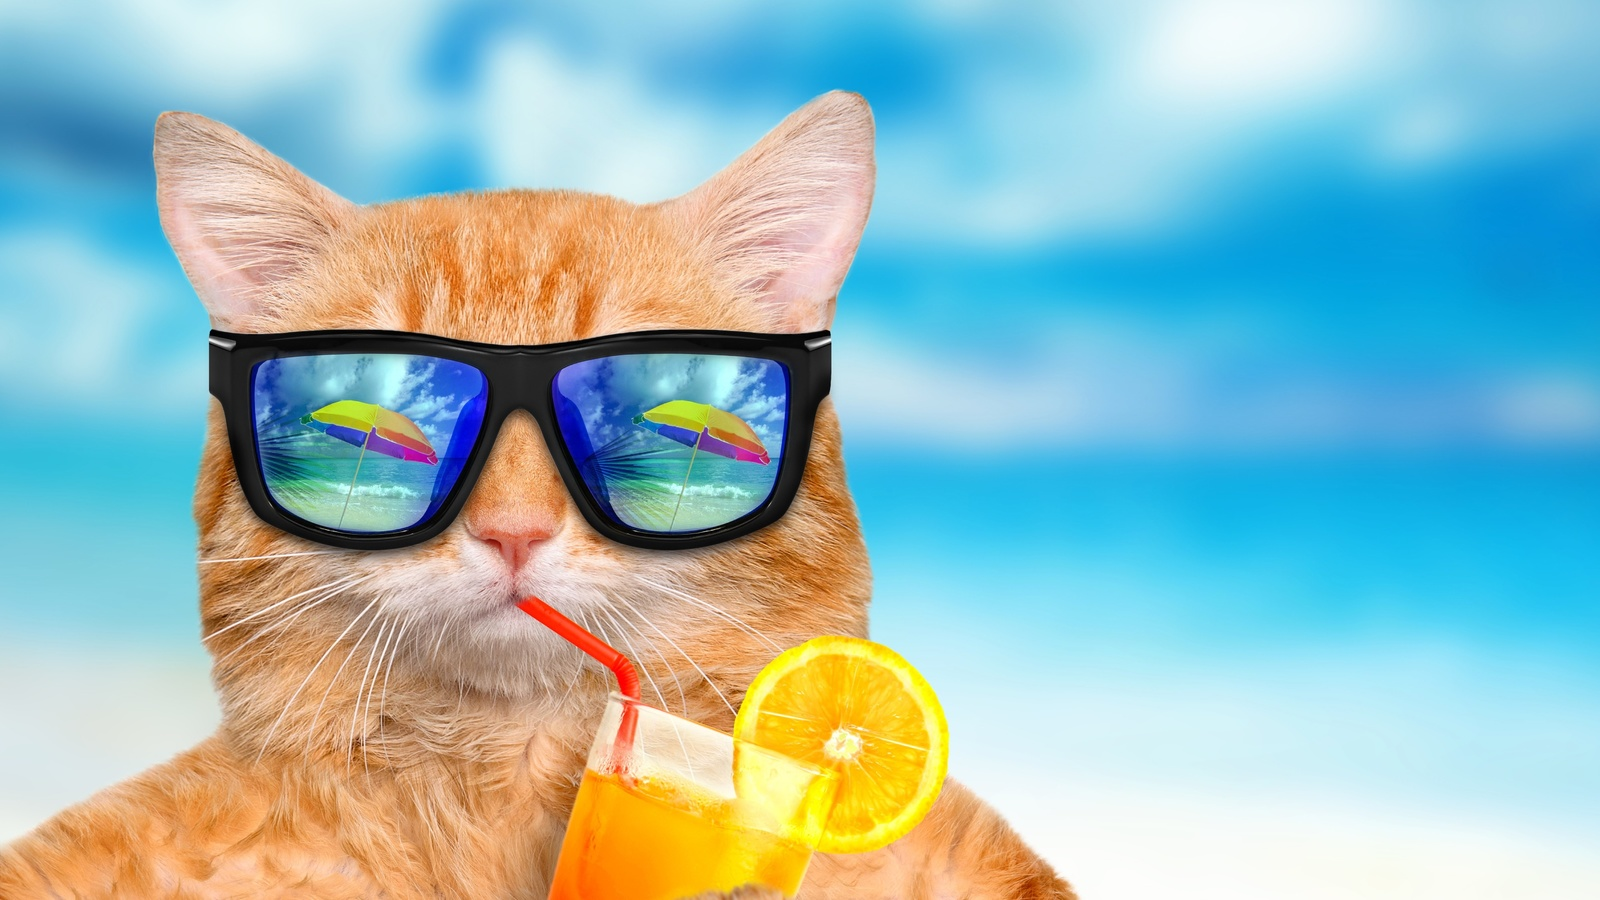 школы картинки скоро отпуск море лето жара гибрид, хотя